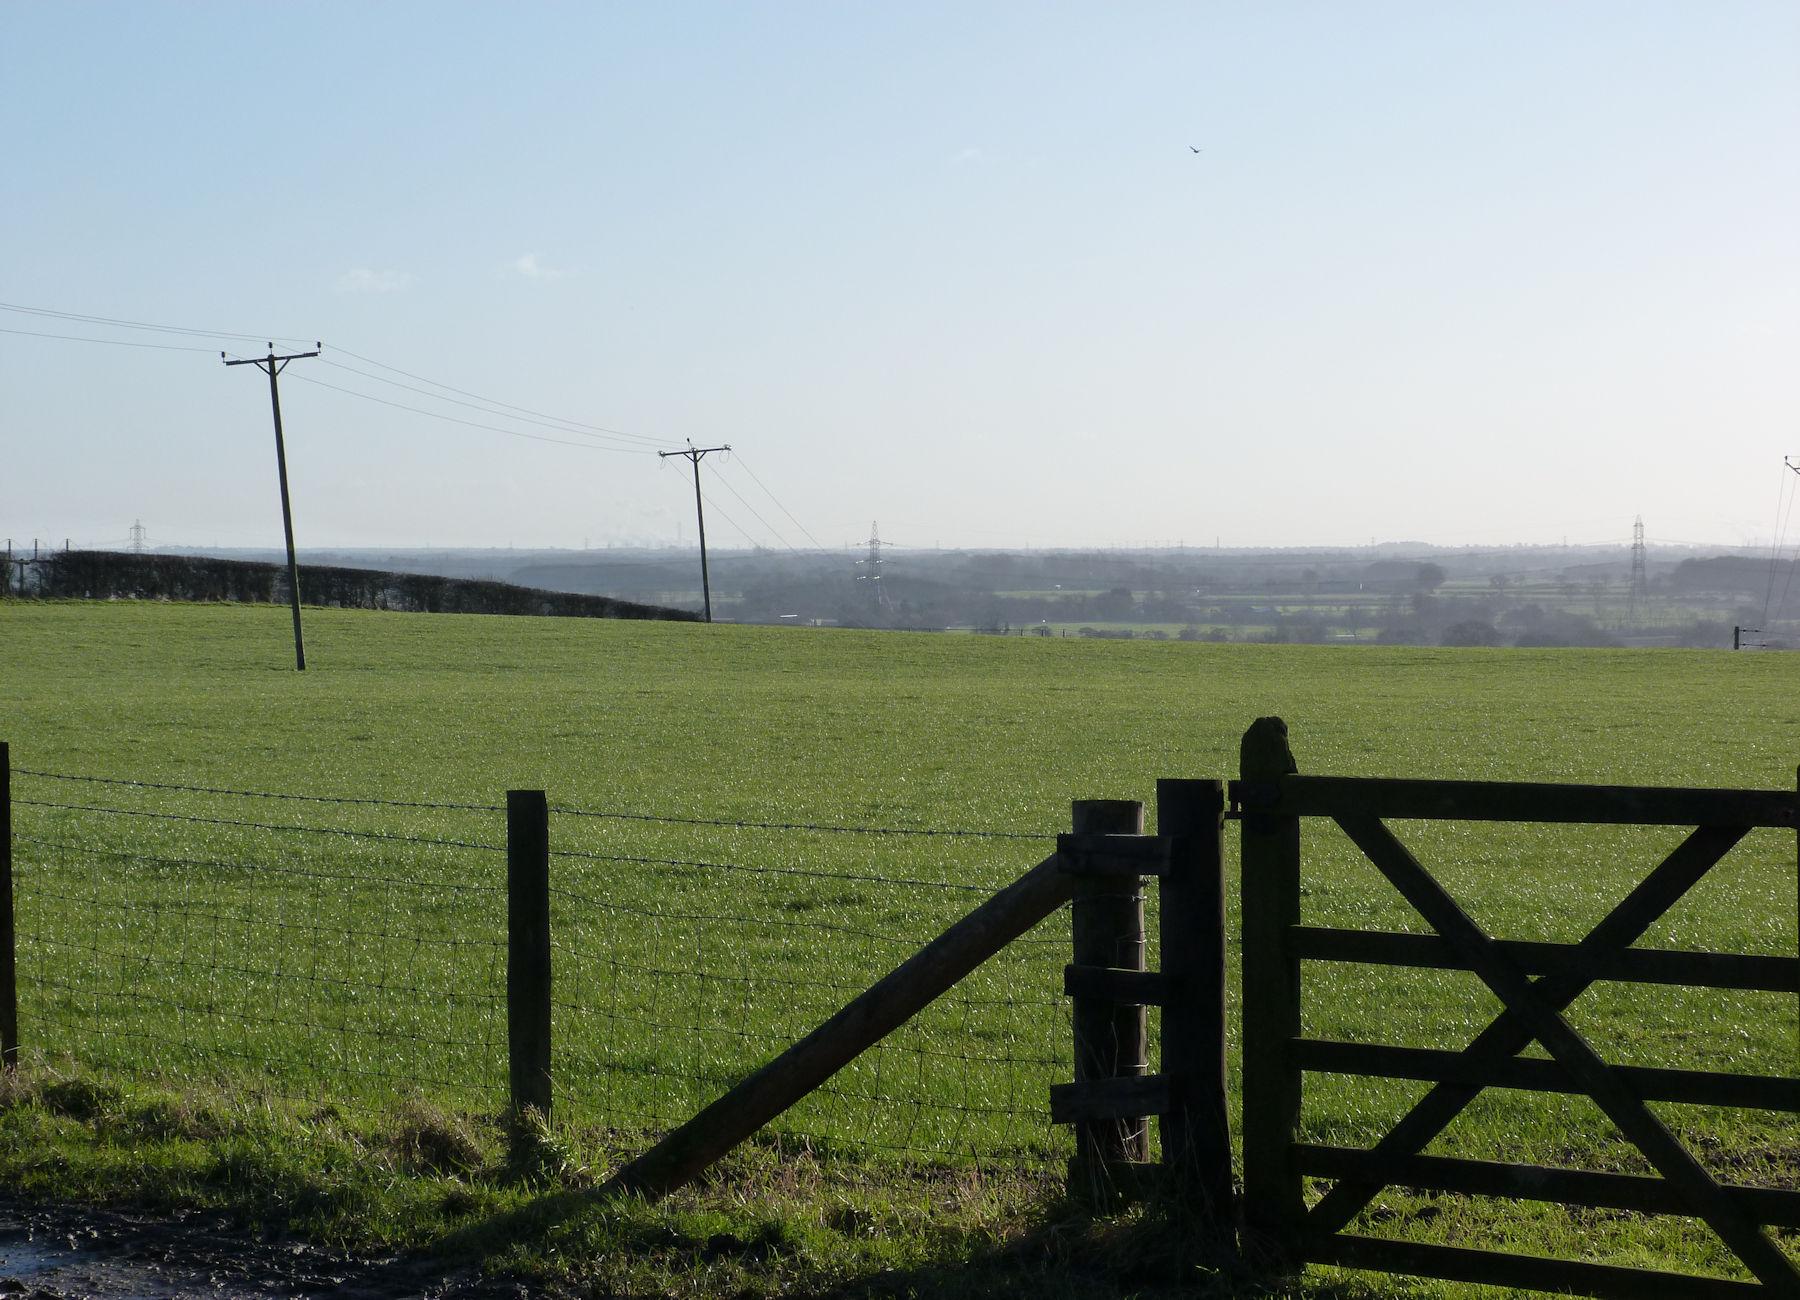 The Vale of York Cornborough